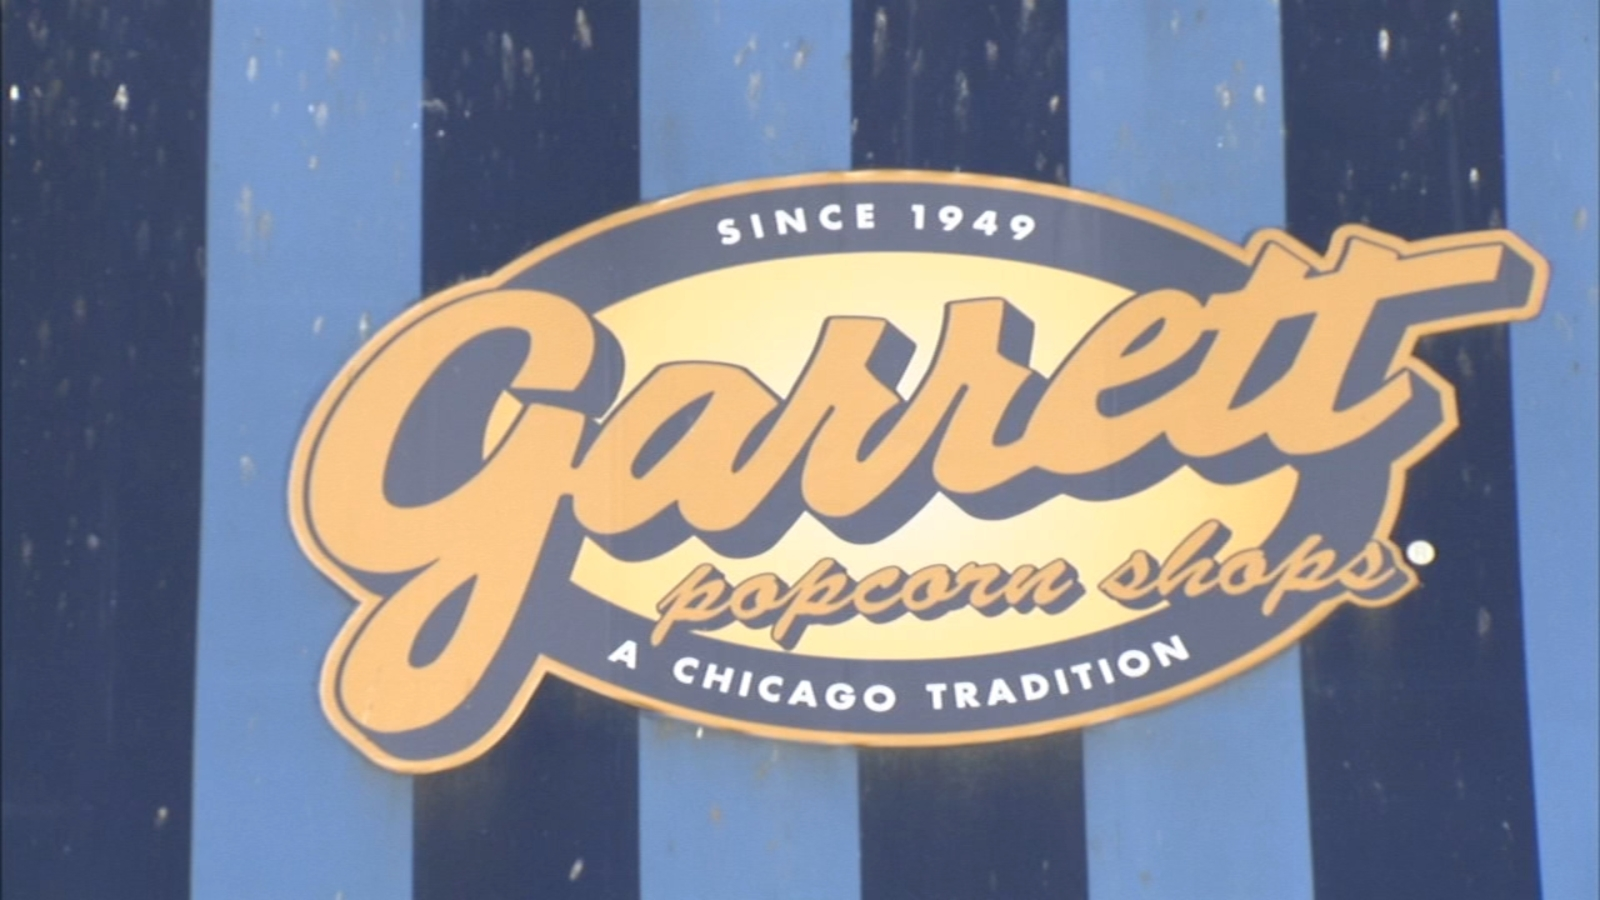 Fired Garrett Popcorn Shops employee accused of stealing secret popcorn recipes, lawsuit alleges